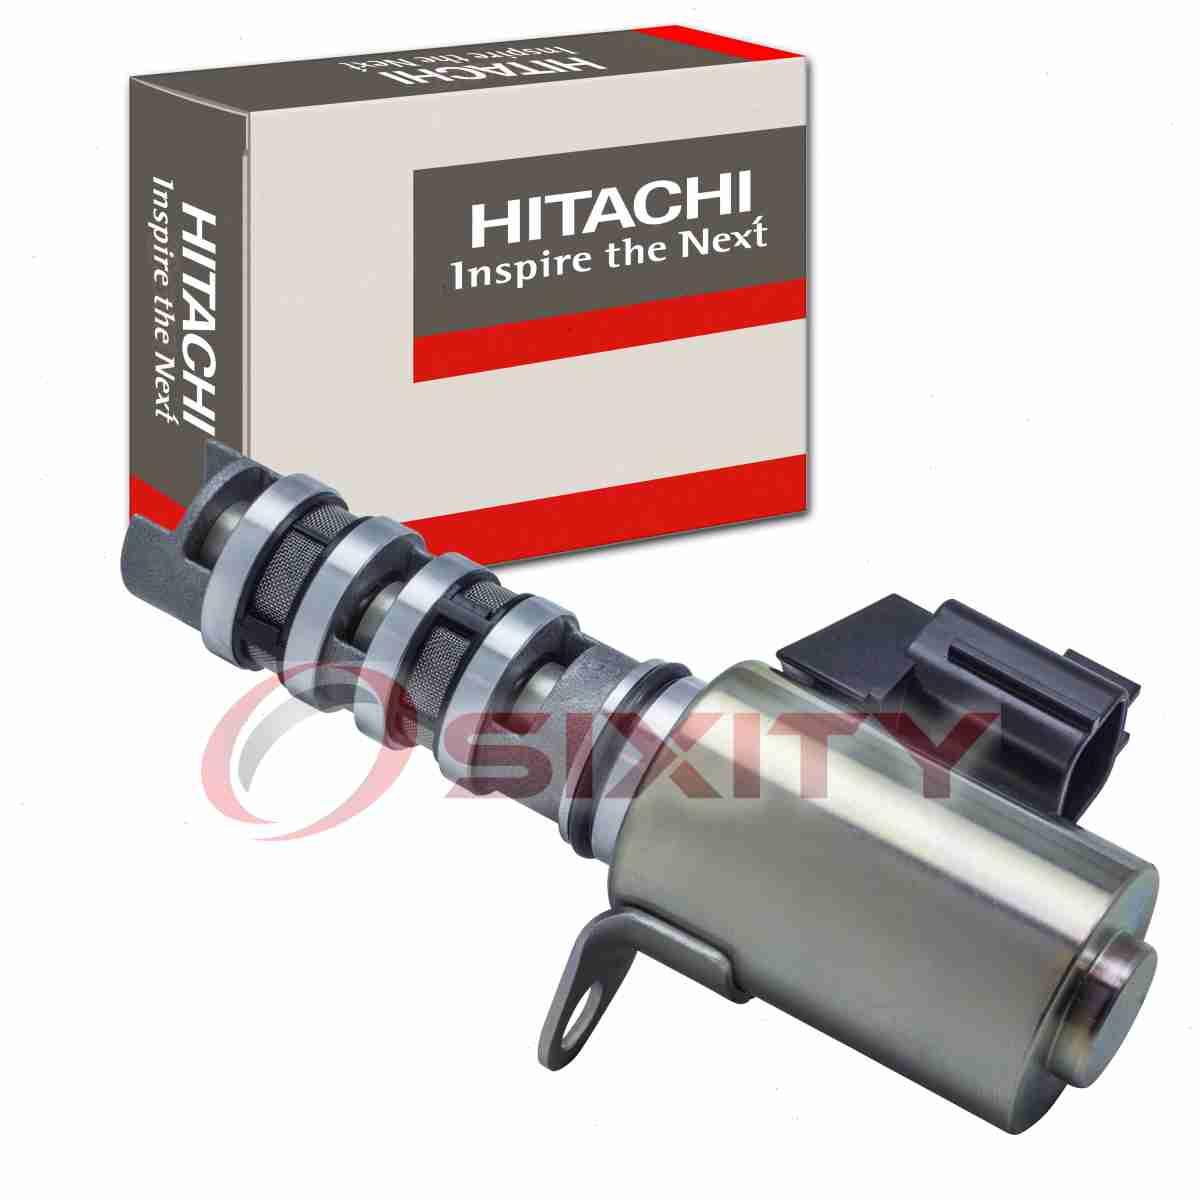 Engine sh Hitachi Left Variable Timing Solenoid for 2001-2003 Infiniti QX4